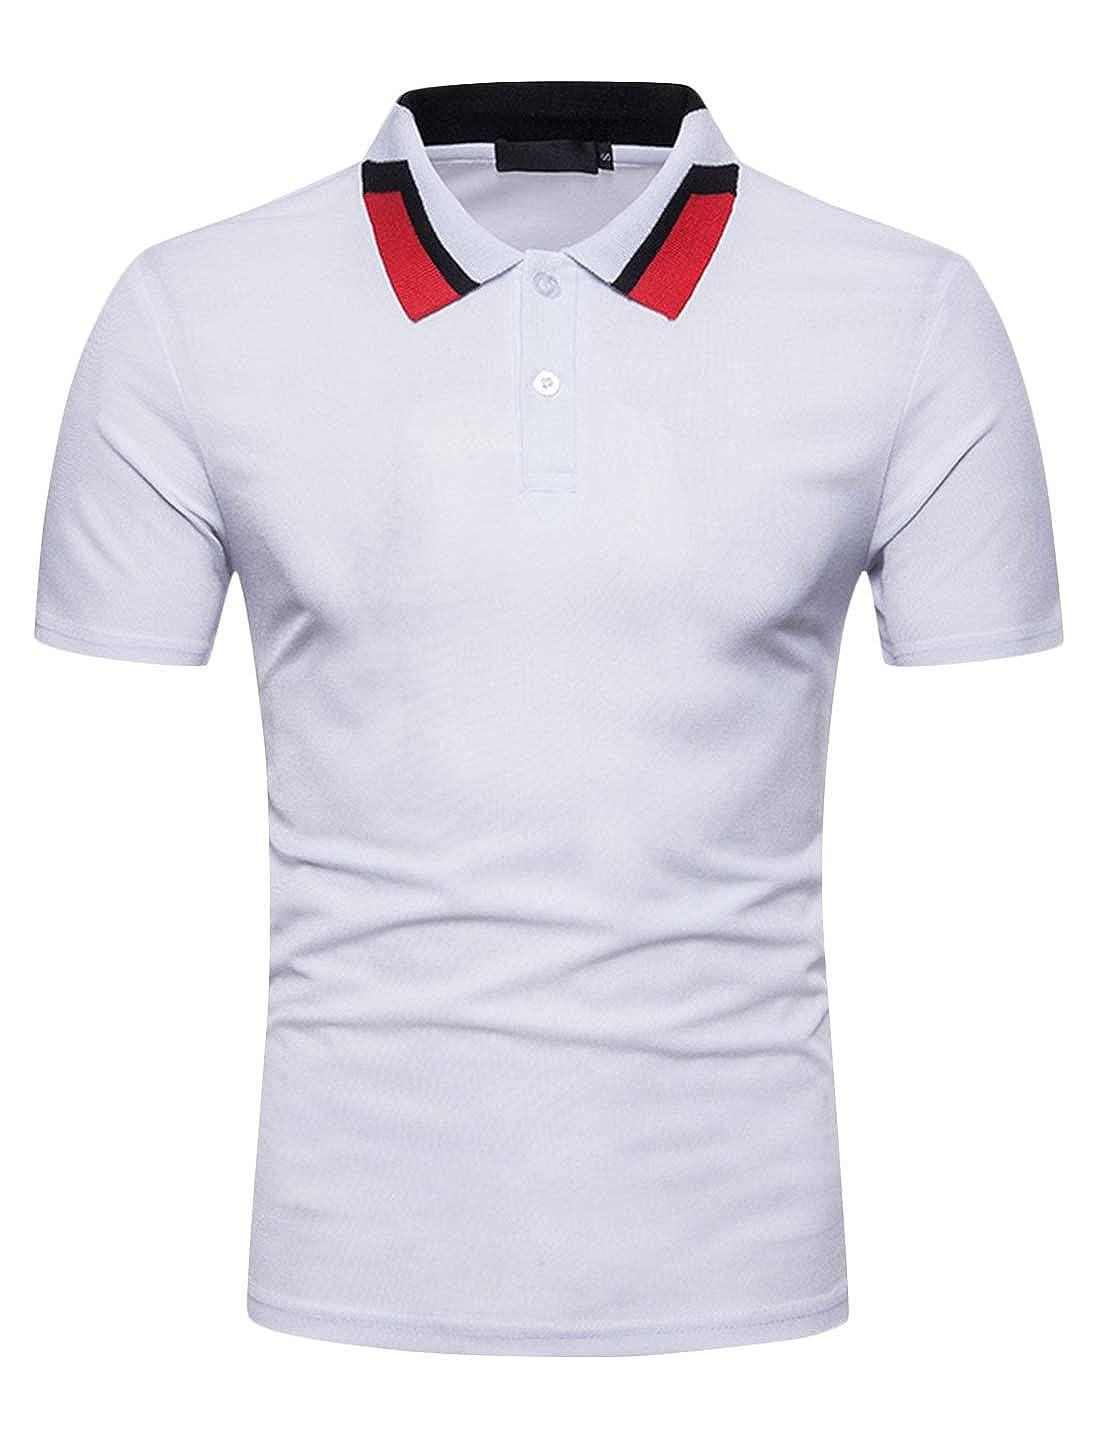 Springrain Mens Summer Stylish Slim Fit Short Sleeve Polo T-Shirt